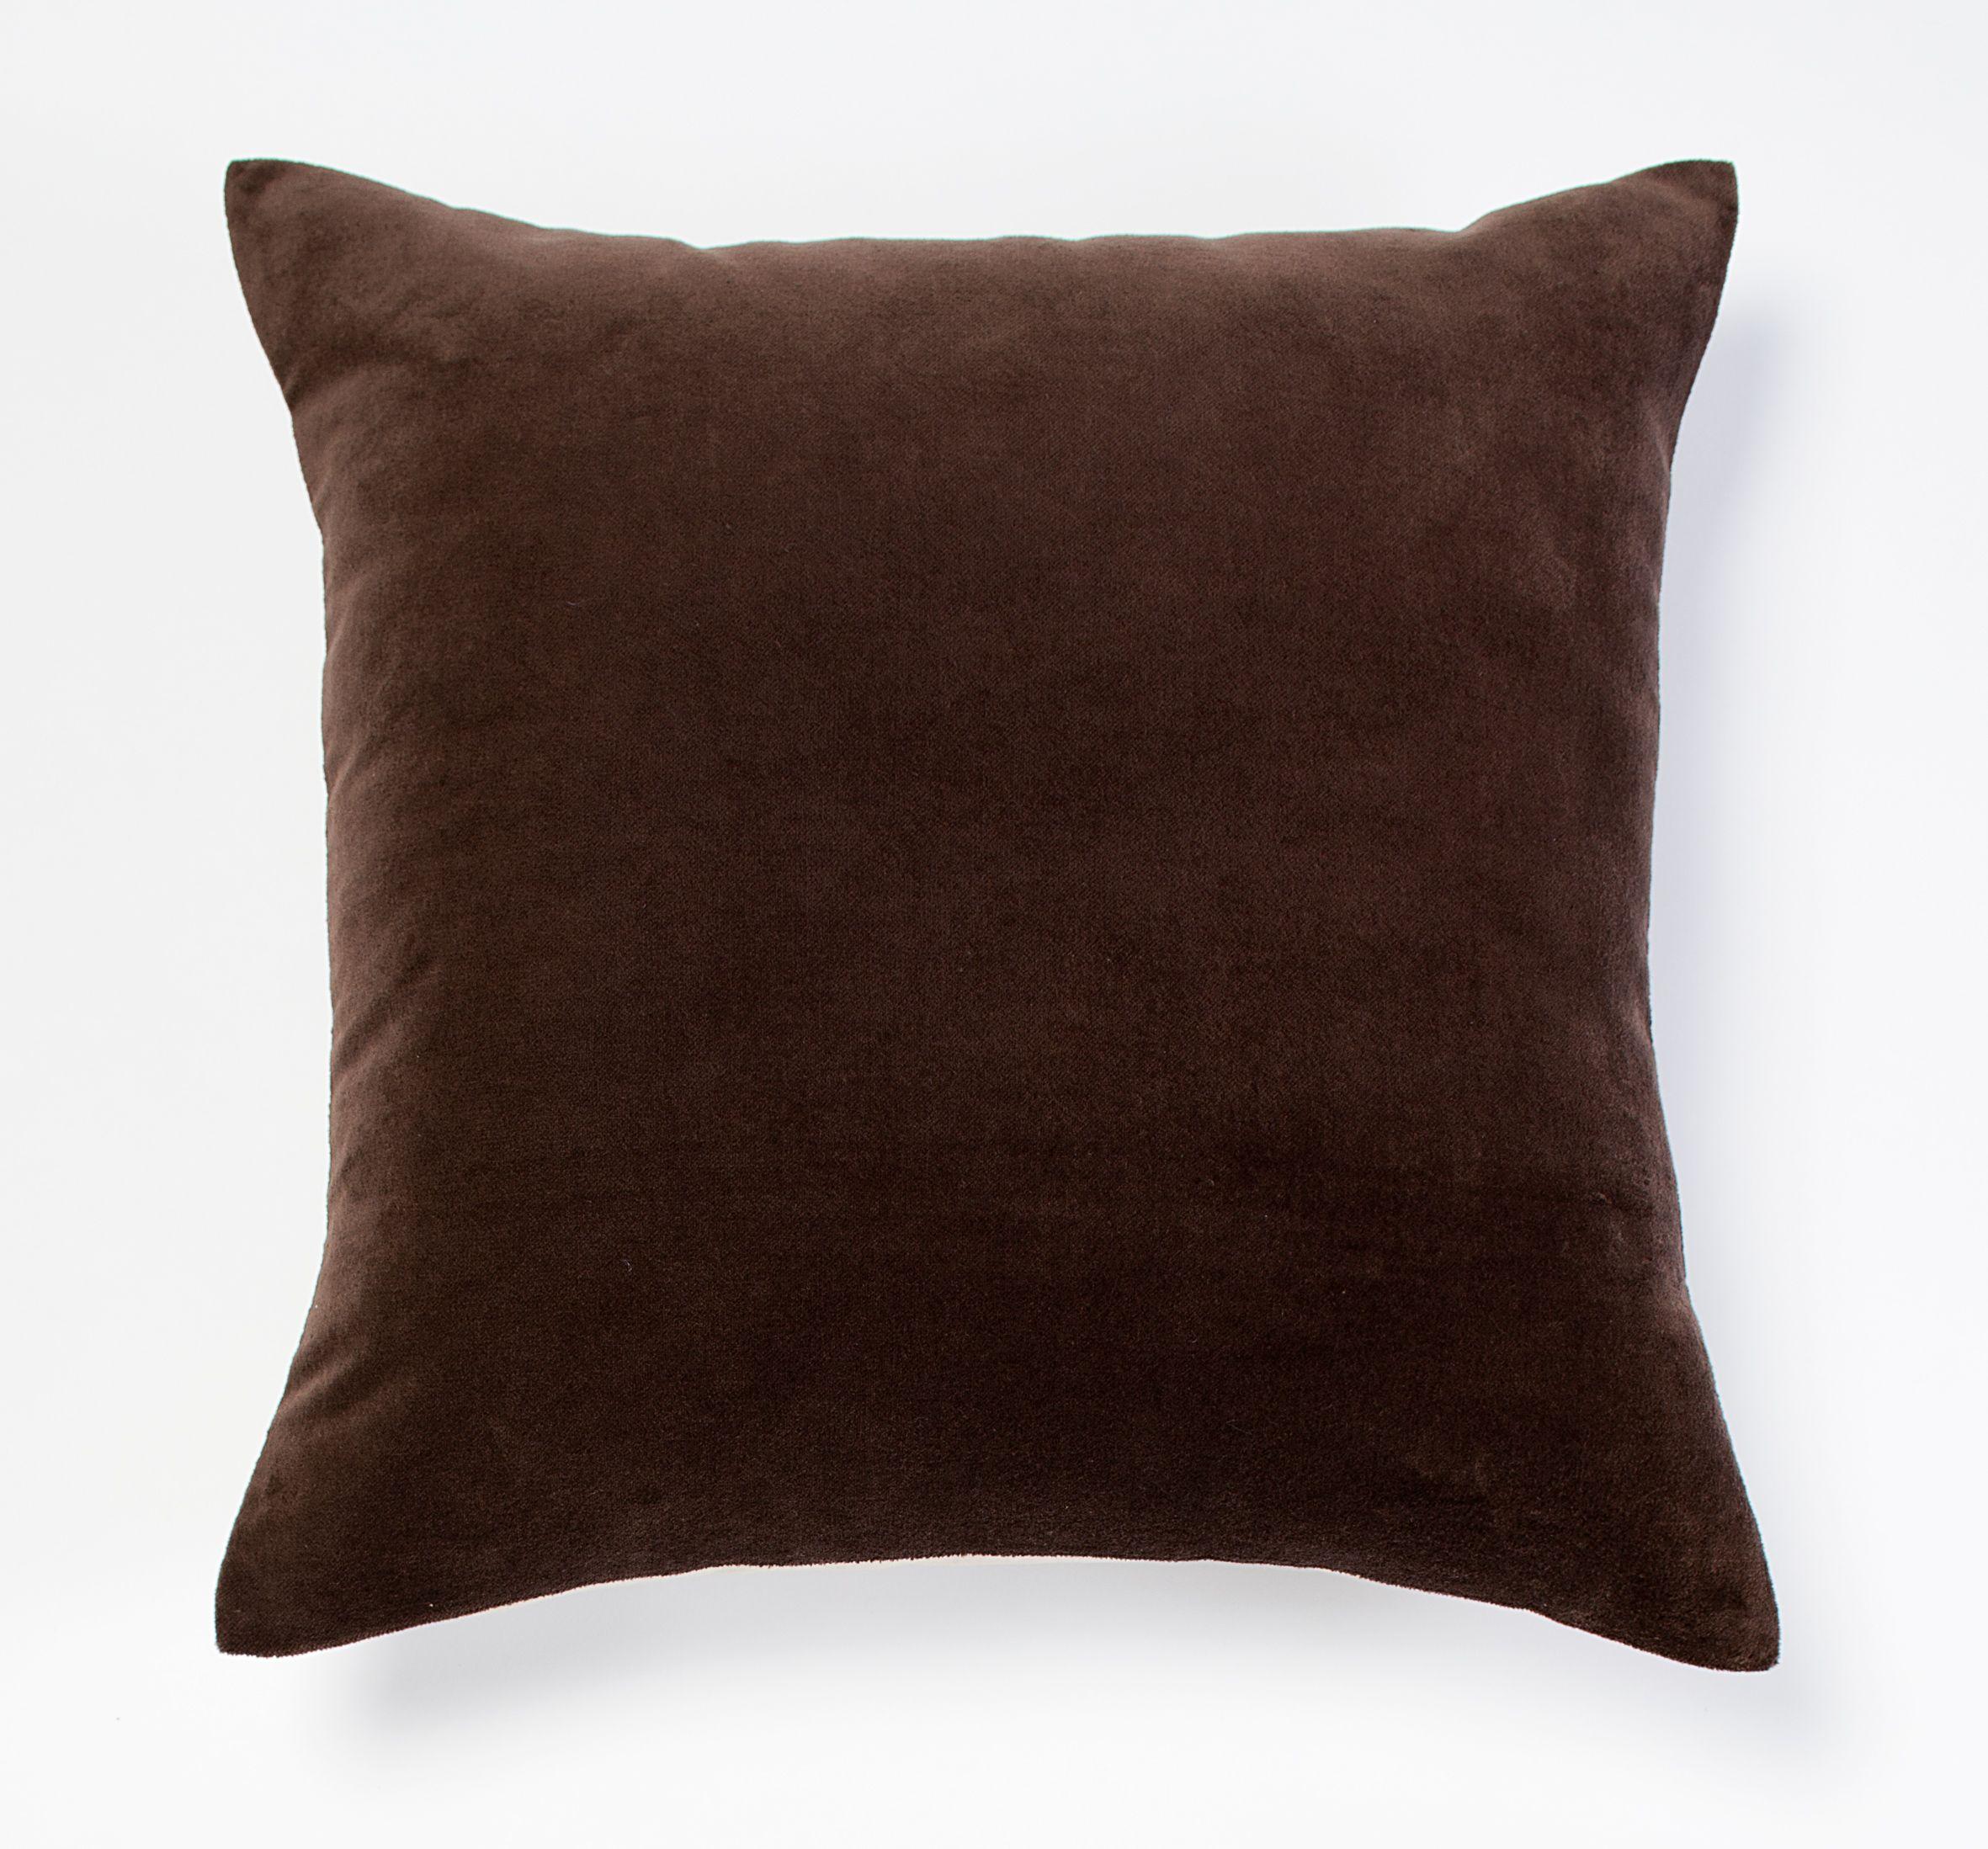 Morris velvet cushion - chocolate